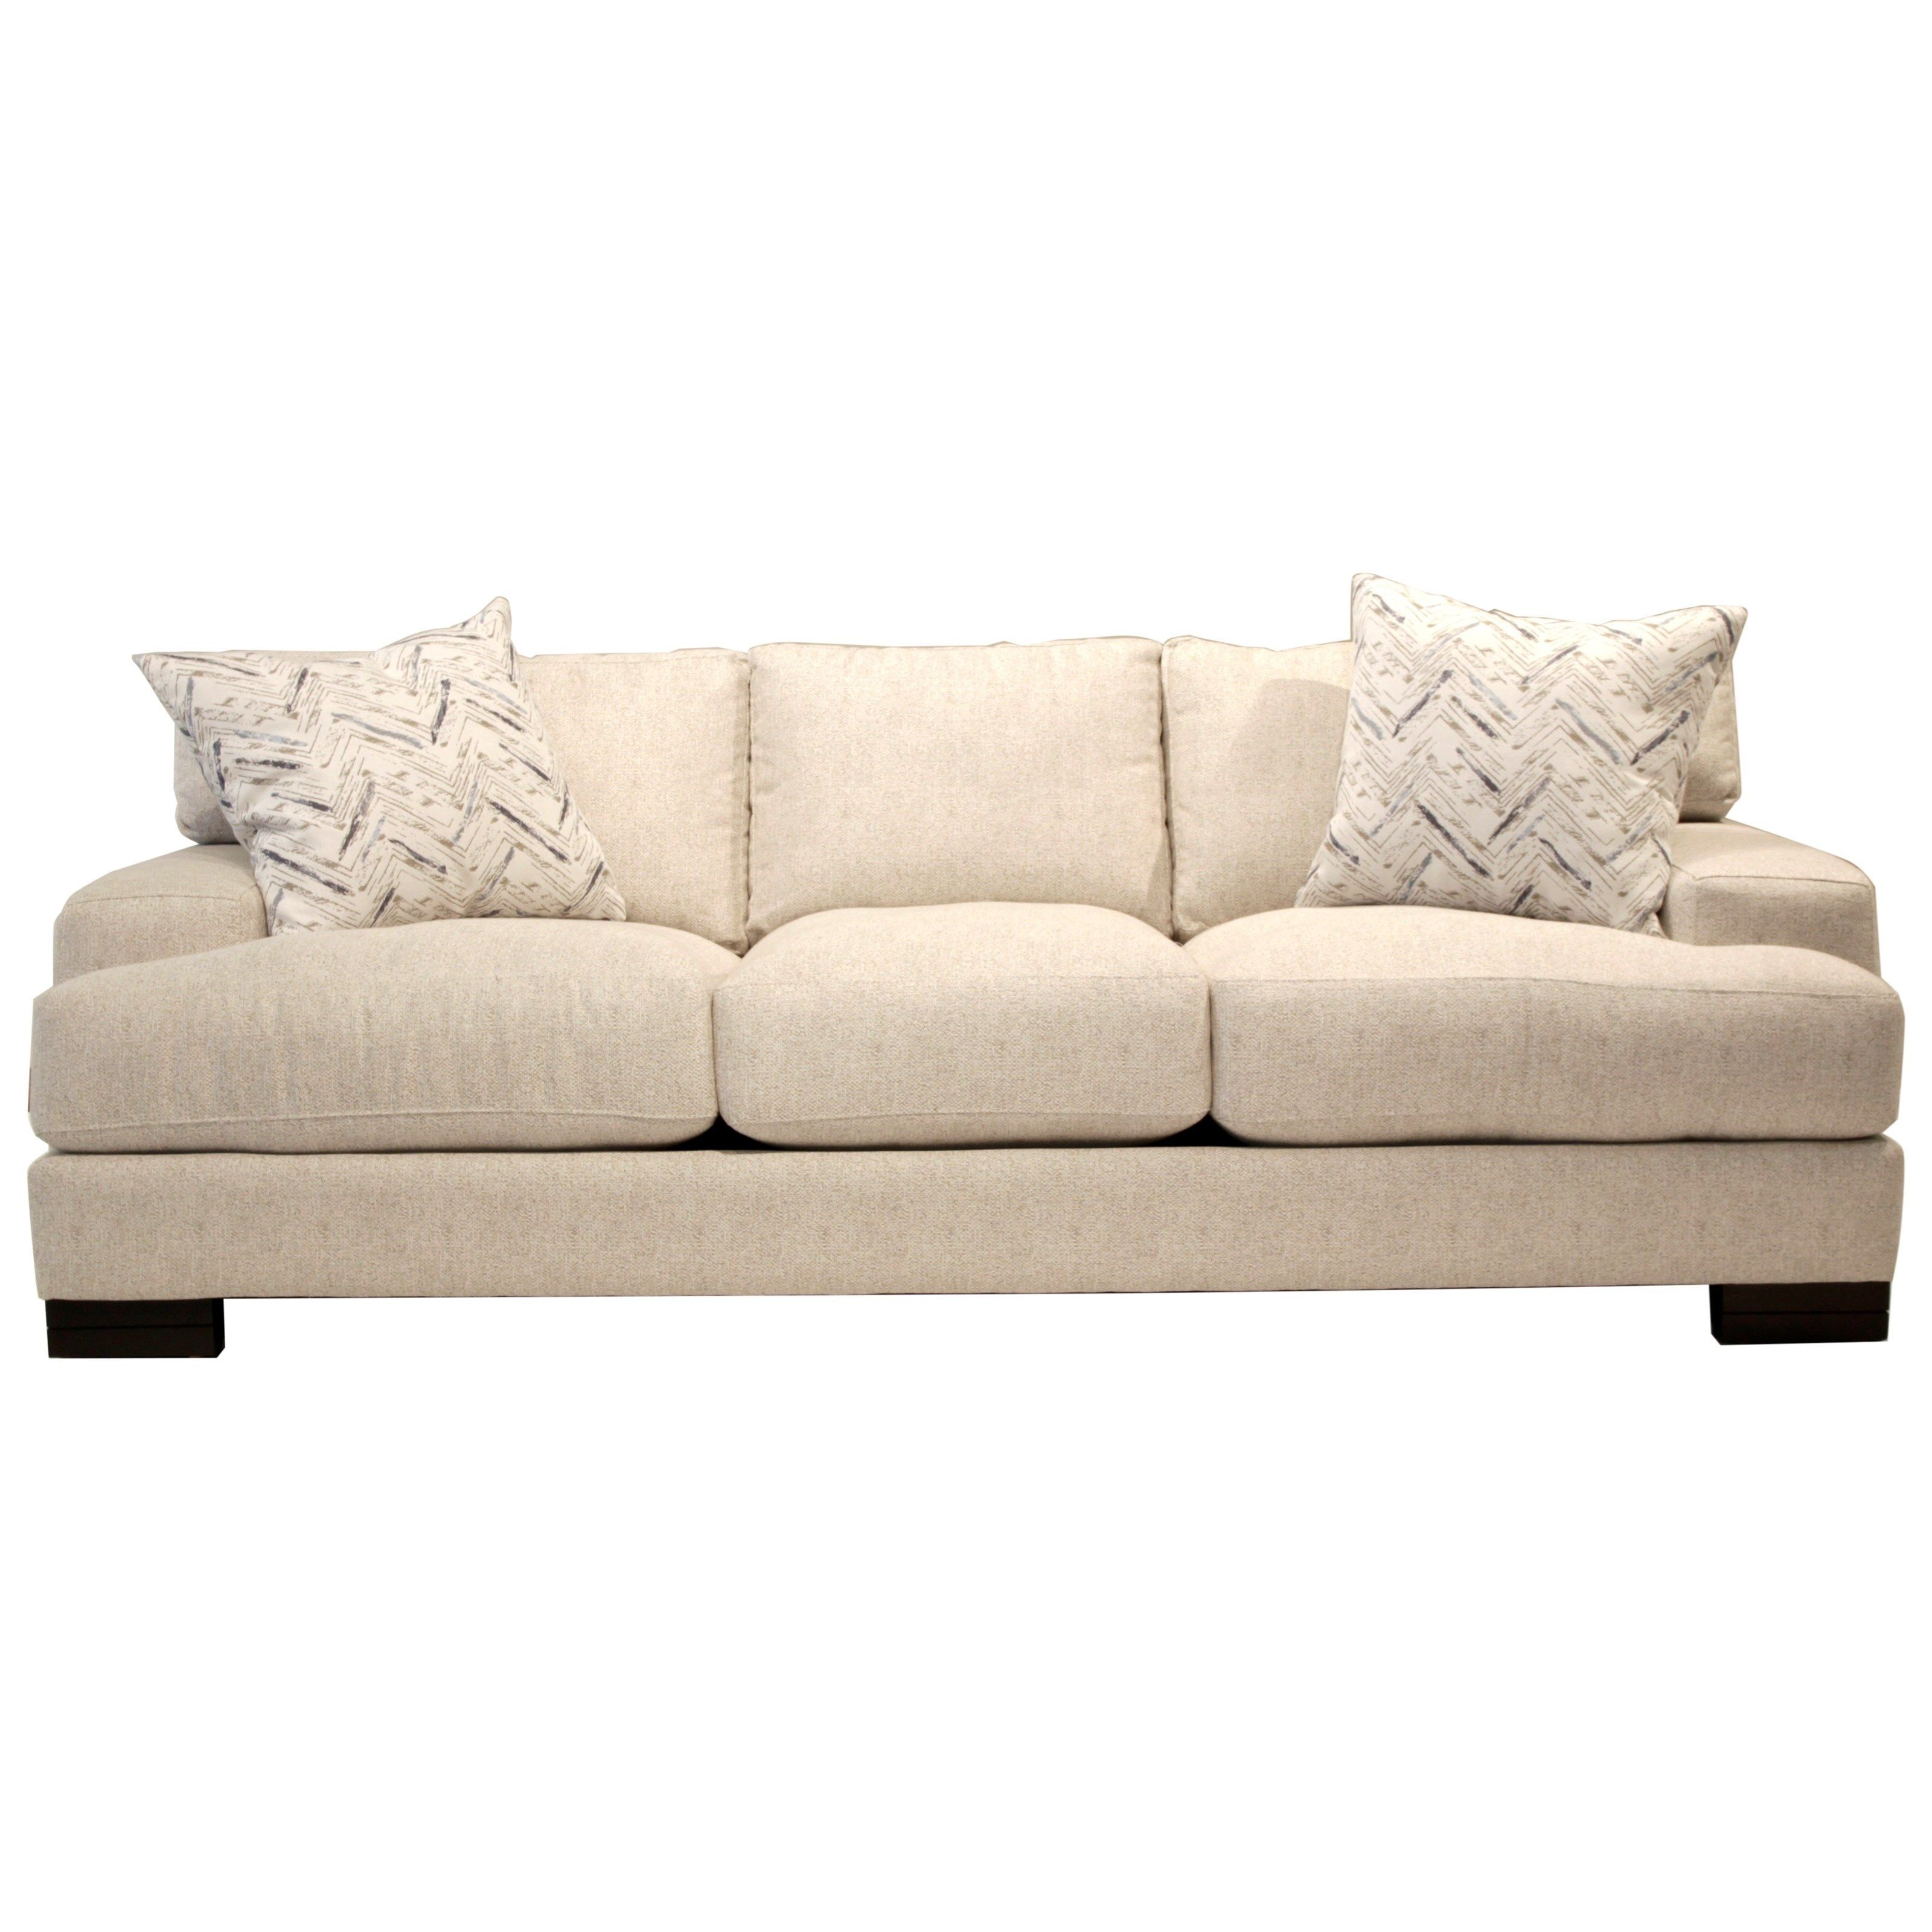 Burton Sofa By Jonathan Louis Furniture Sofa Contemporary Sofa